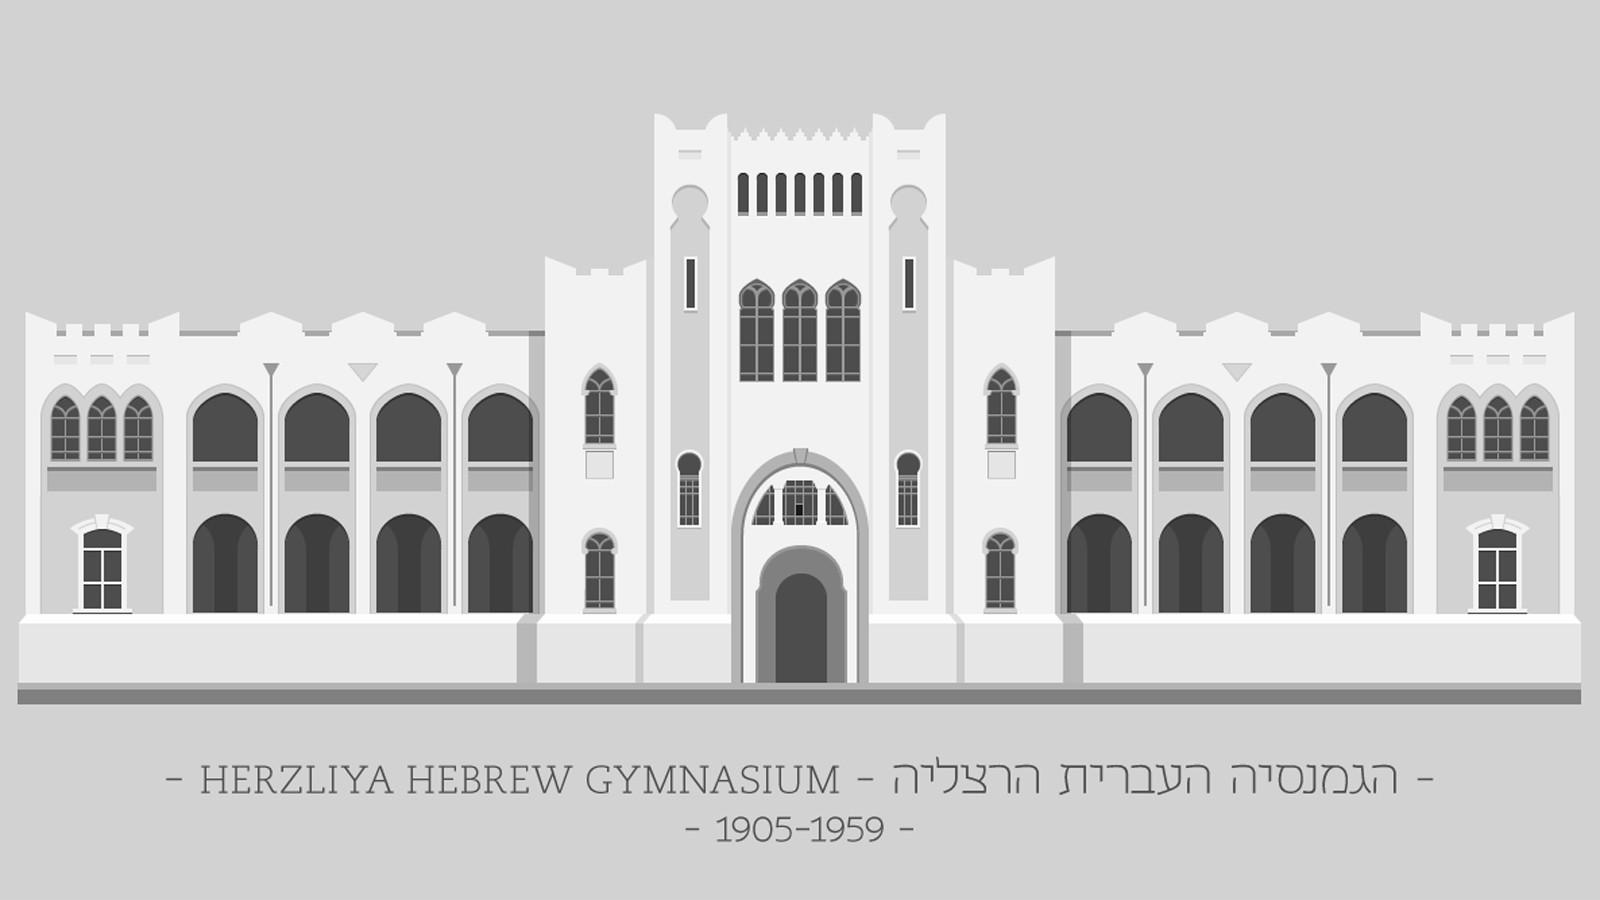 tel-aviv-buildings-2_1600x900